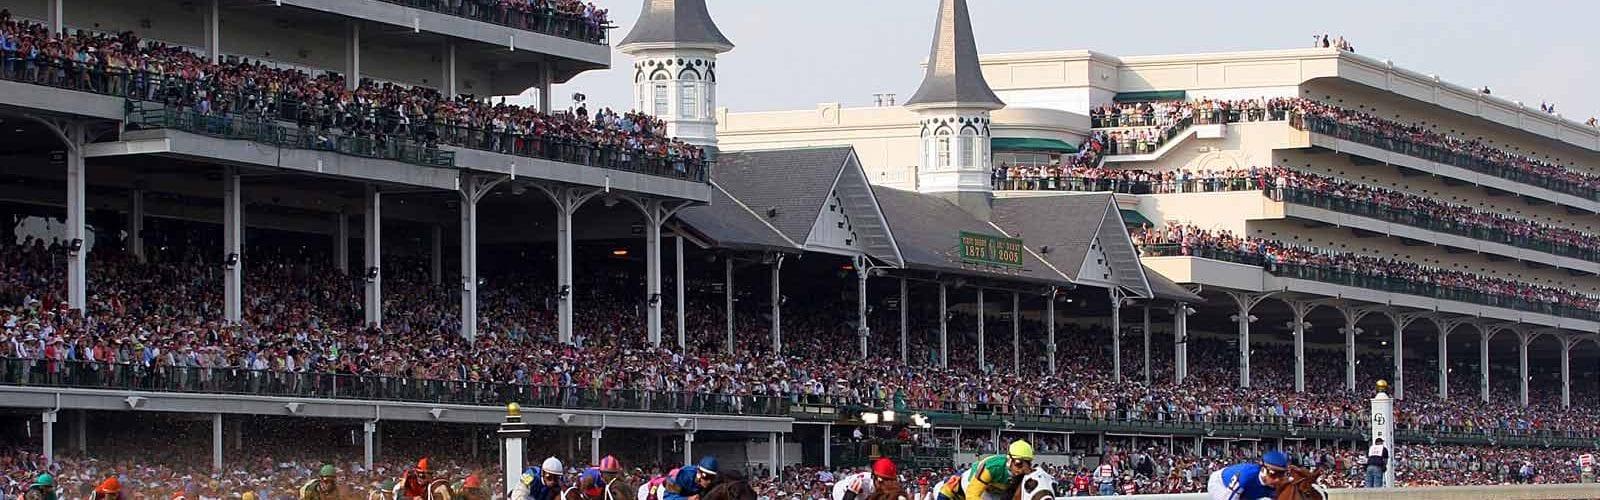 Kentucky Derby 2018 Saddling Up to Break Records